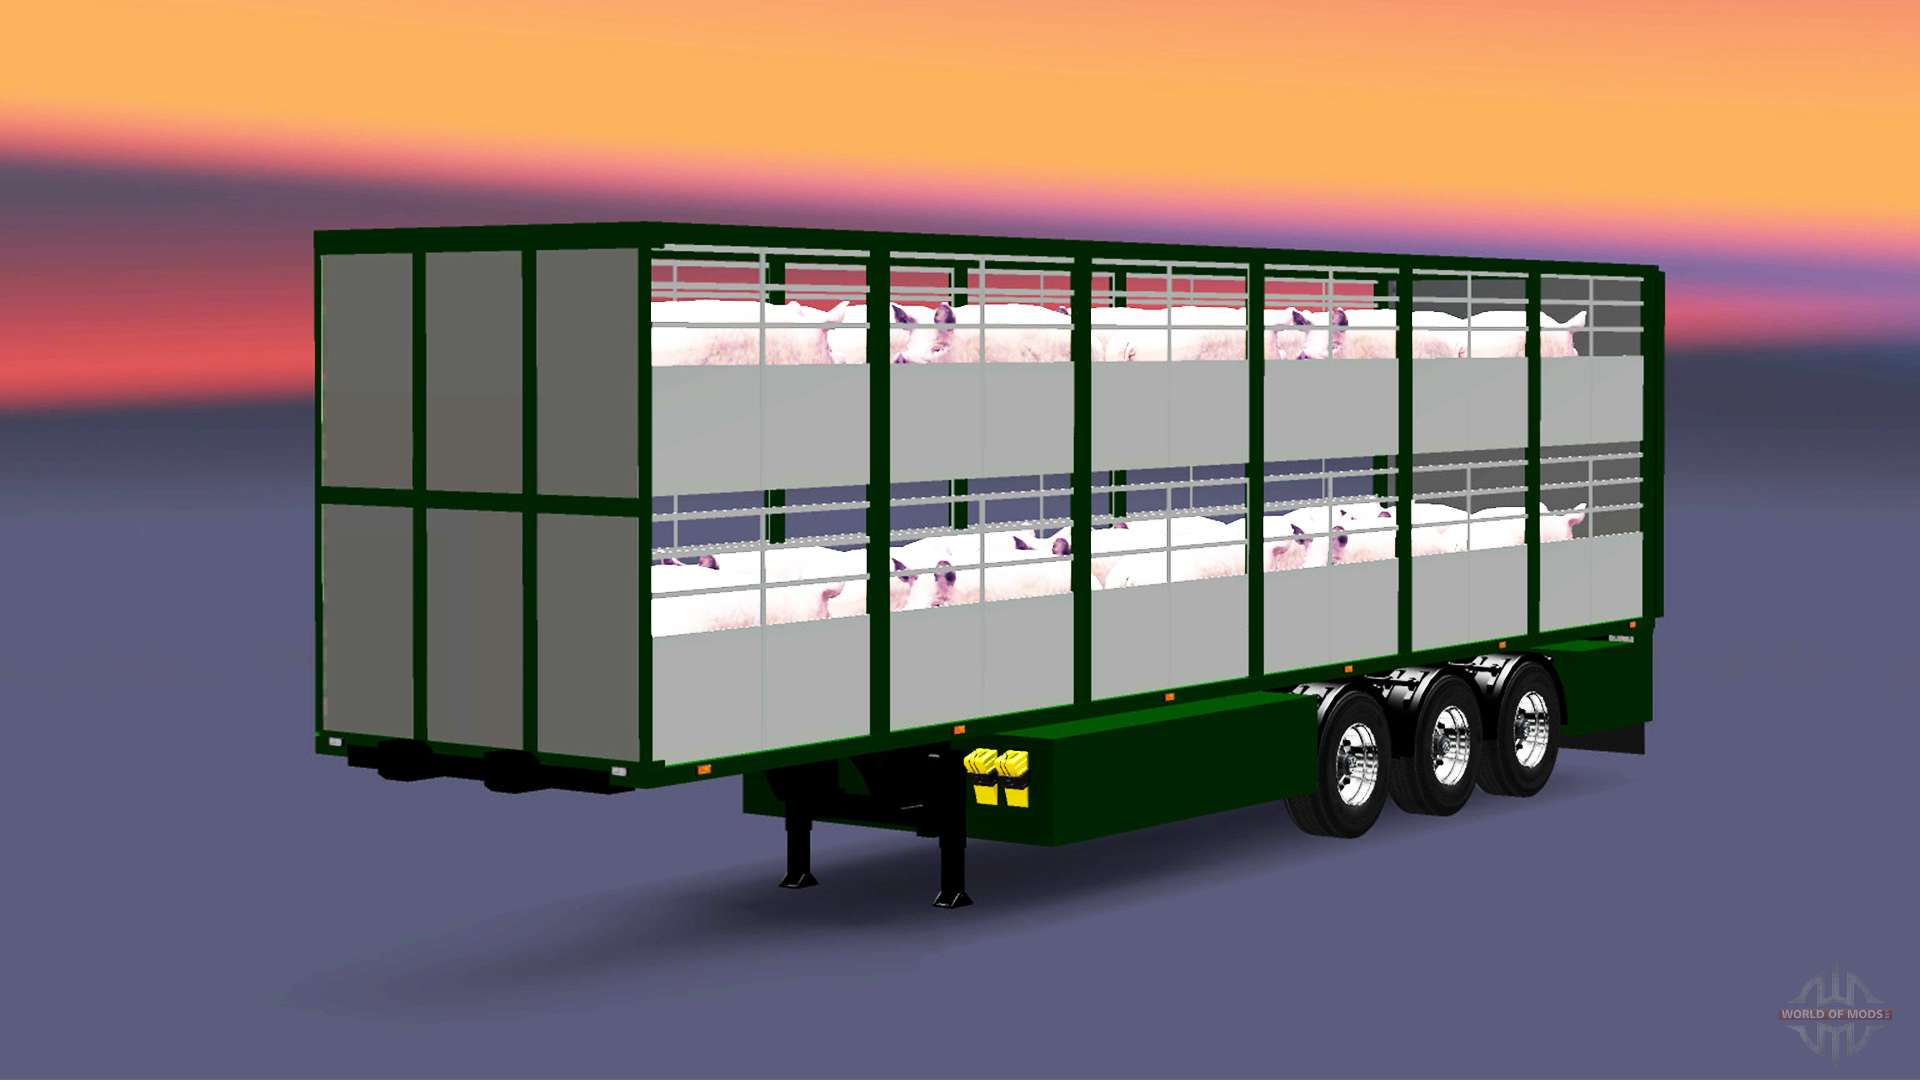 evro-trans-simulyator-3